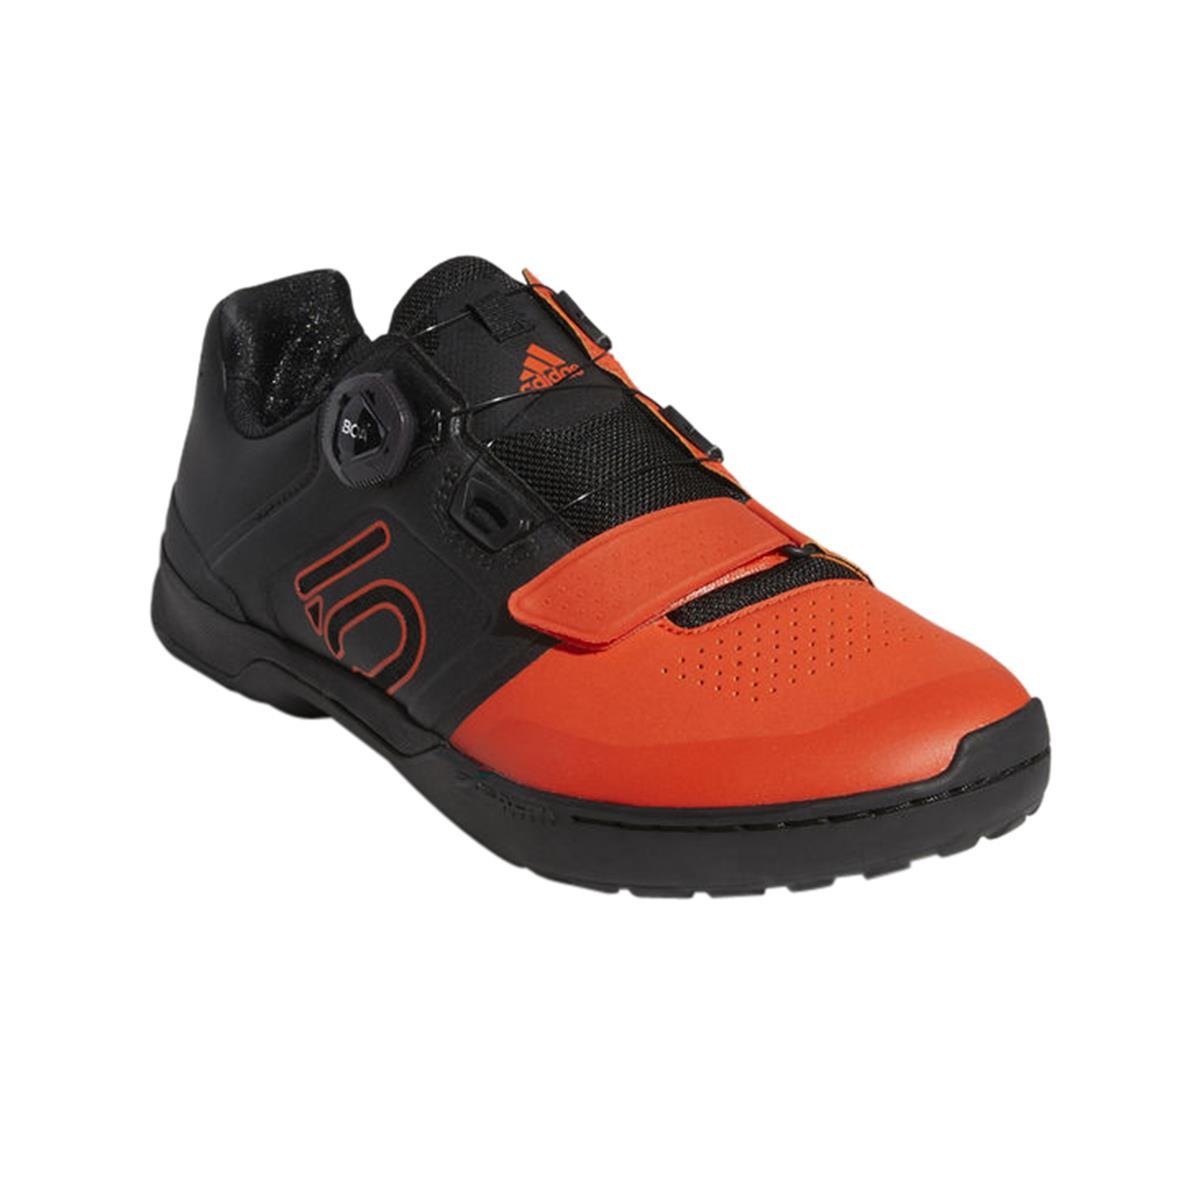 Five Ten MTB-Schuhe Kestrel Pro BOA Clipless Active Orange/Core Black/Core Black